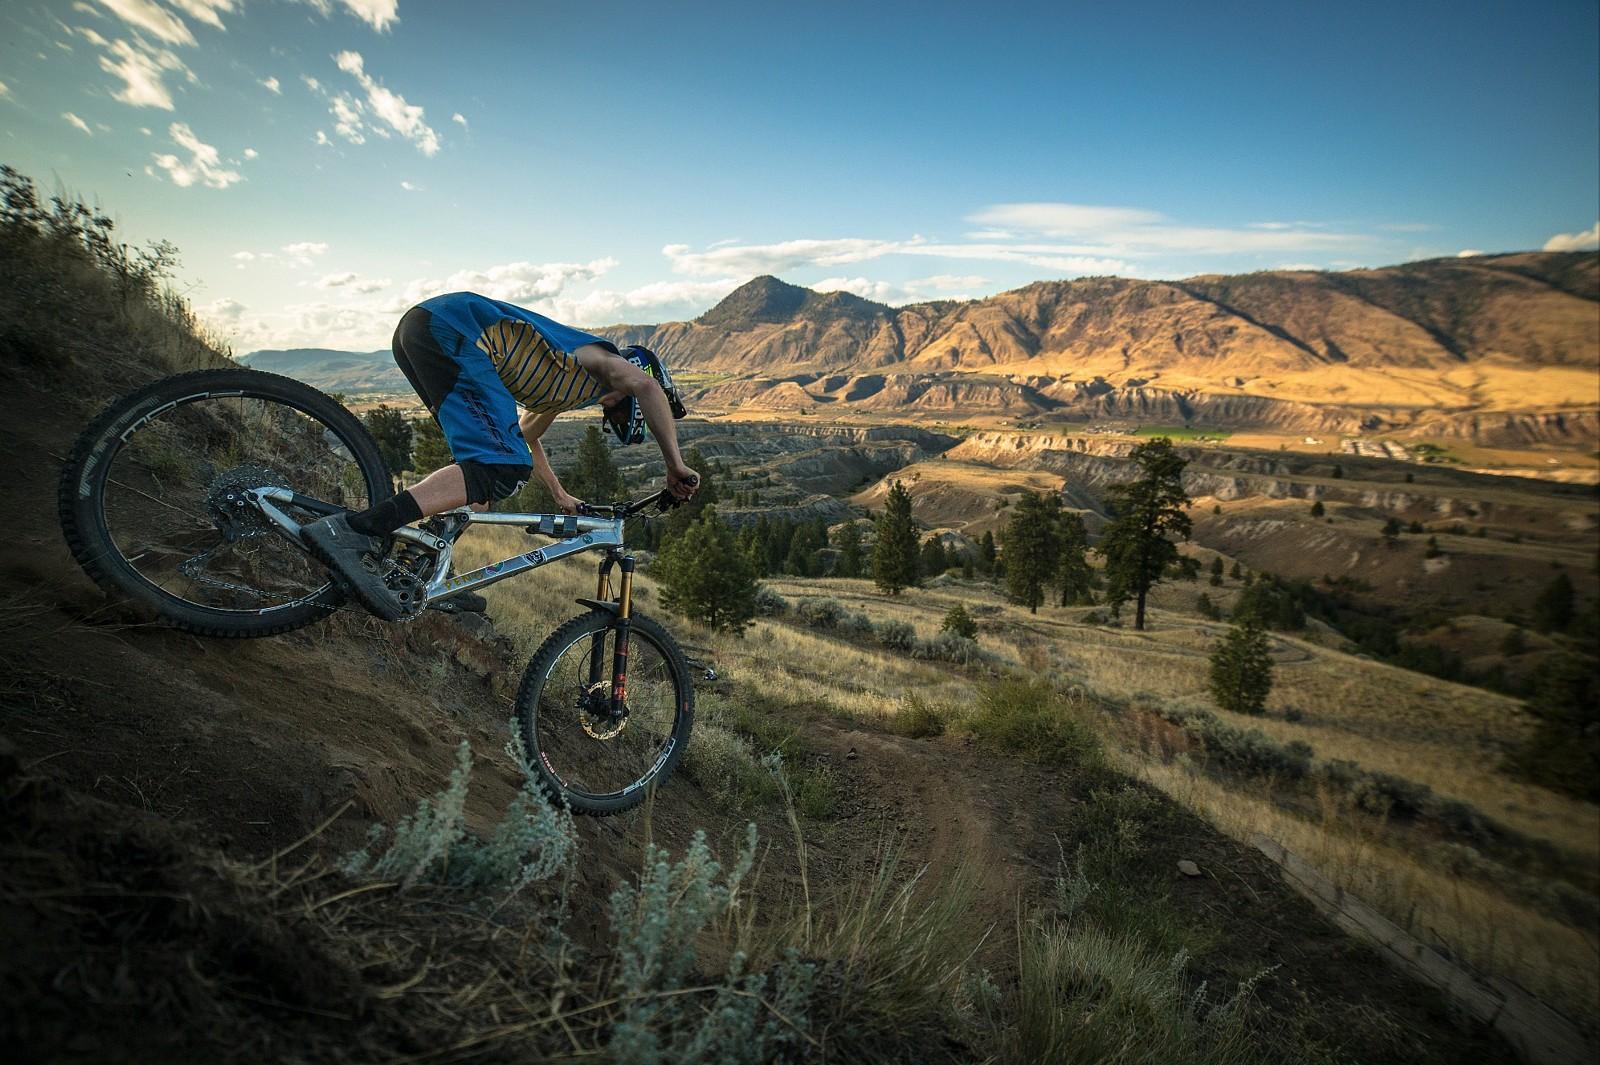 Kamloops at sunset - ThomasGaffney - Mountain Biking Pictures - Vital MTB